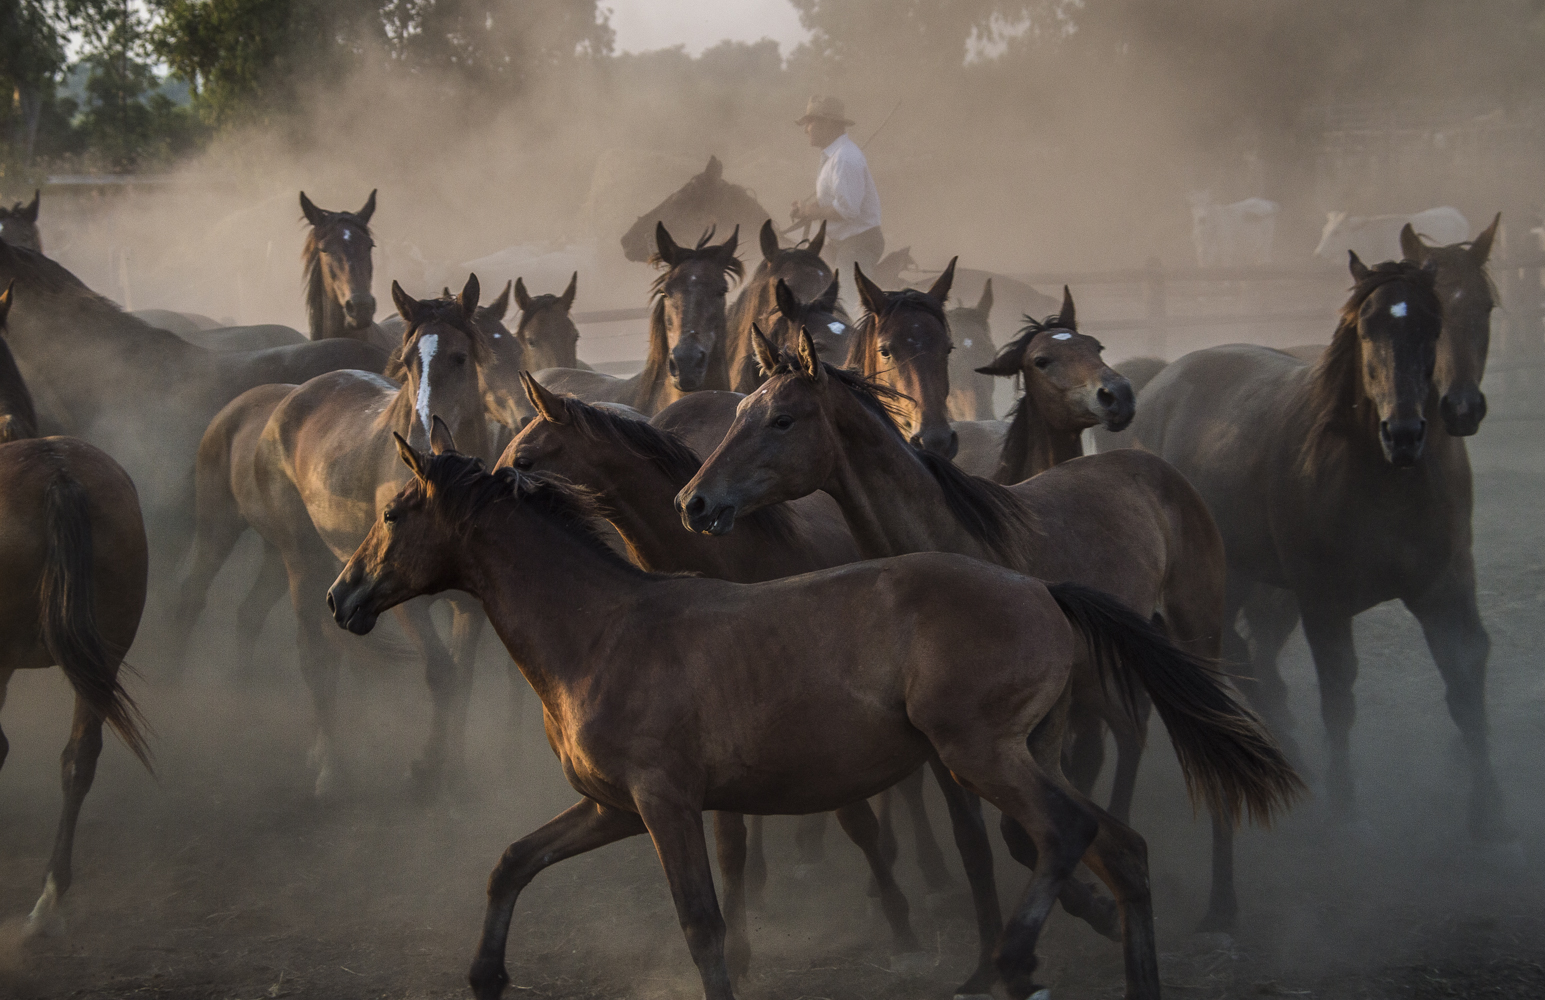 Gabrielle_Saveri_Italian Cowboys of Maremma_Buttero Herding Foals.jpeg